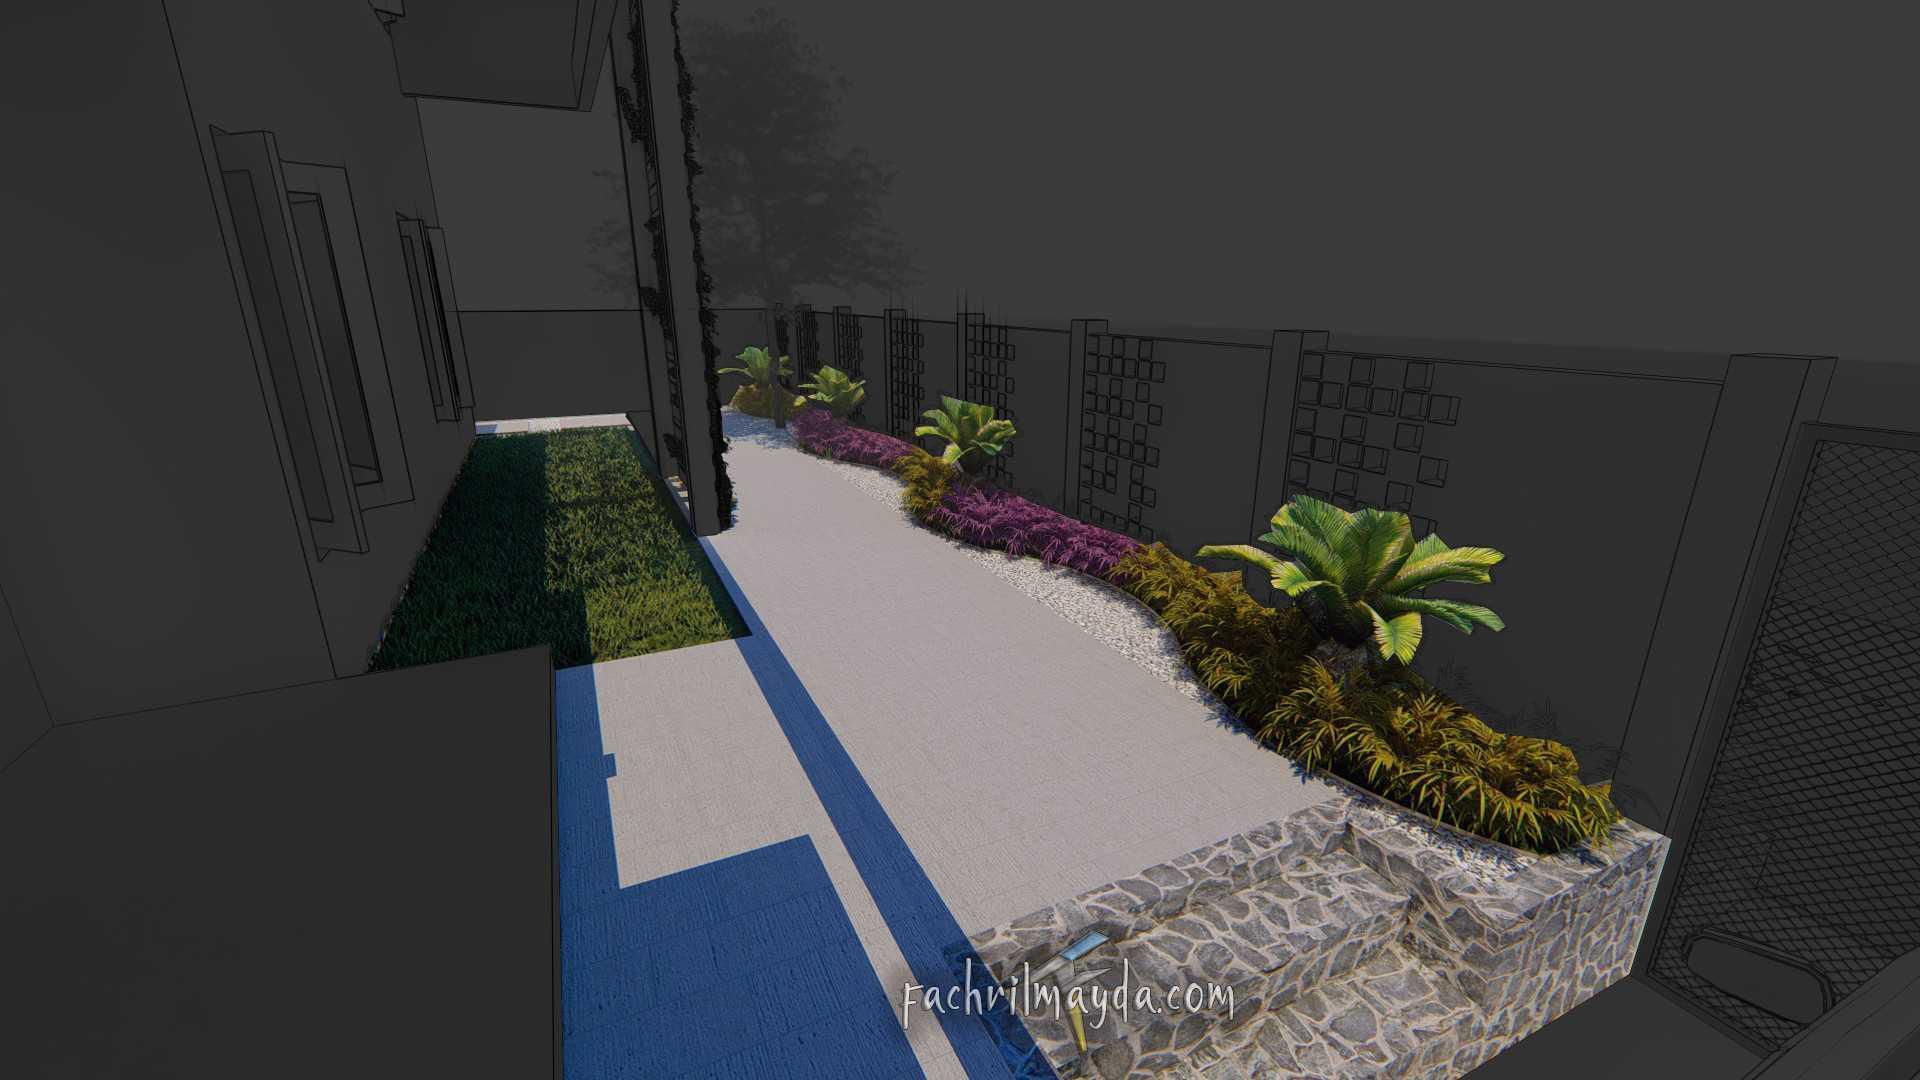 Strata Architect J-House Kabupaten Lombok Barat, Nusa Tenggara Bar., Indonesia Kabupaten Lombok Barat, Nusa Tenggara Bar., Indonesia Strata-Architect-J-House   99066